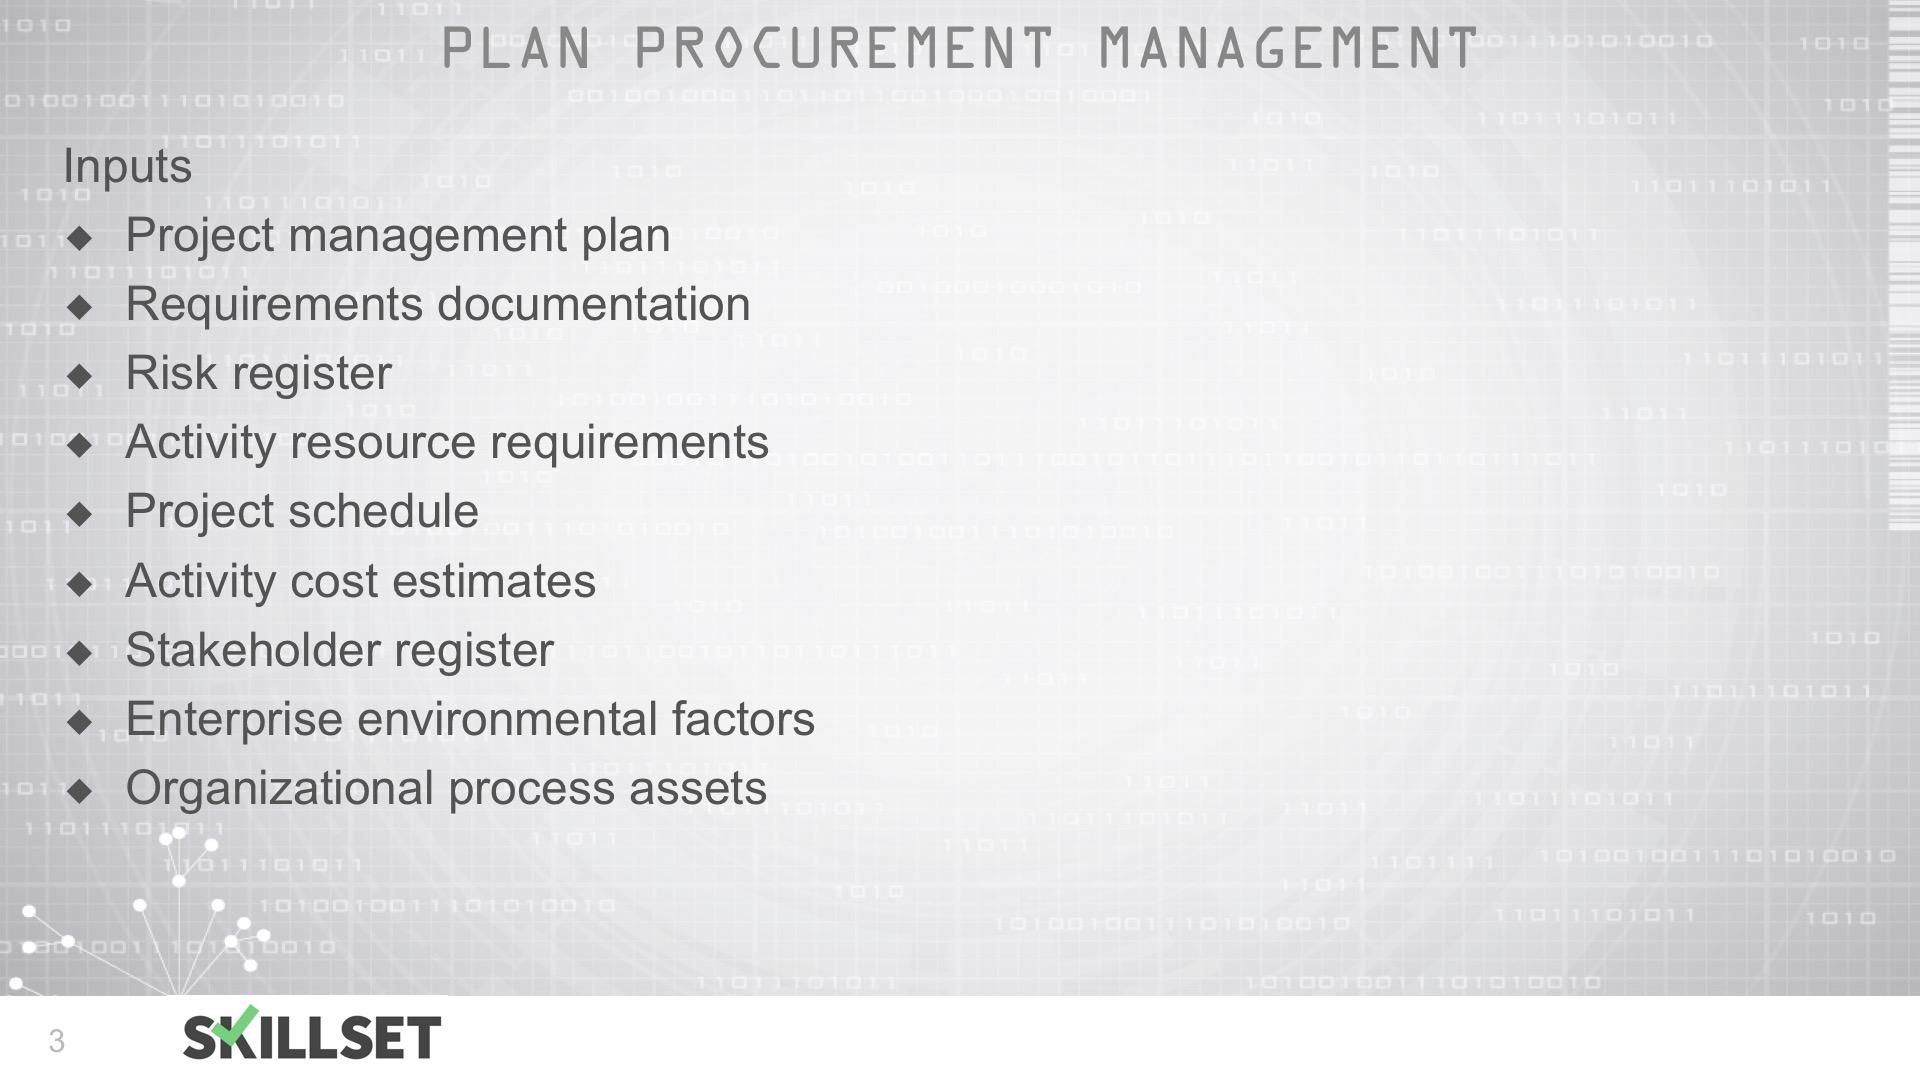 T94-Controlling Procurements Inputs, Tools and Techniques